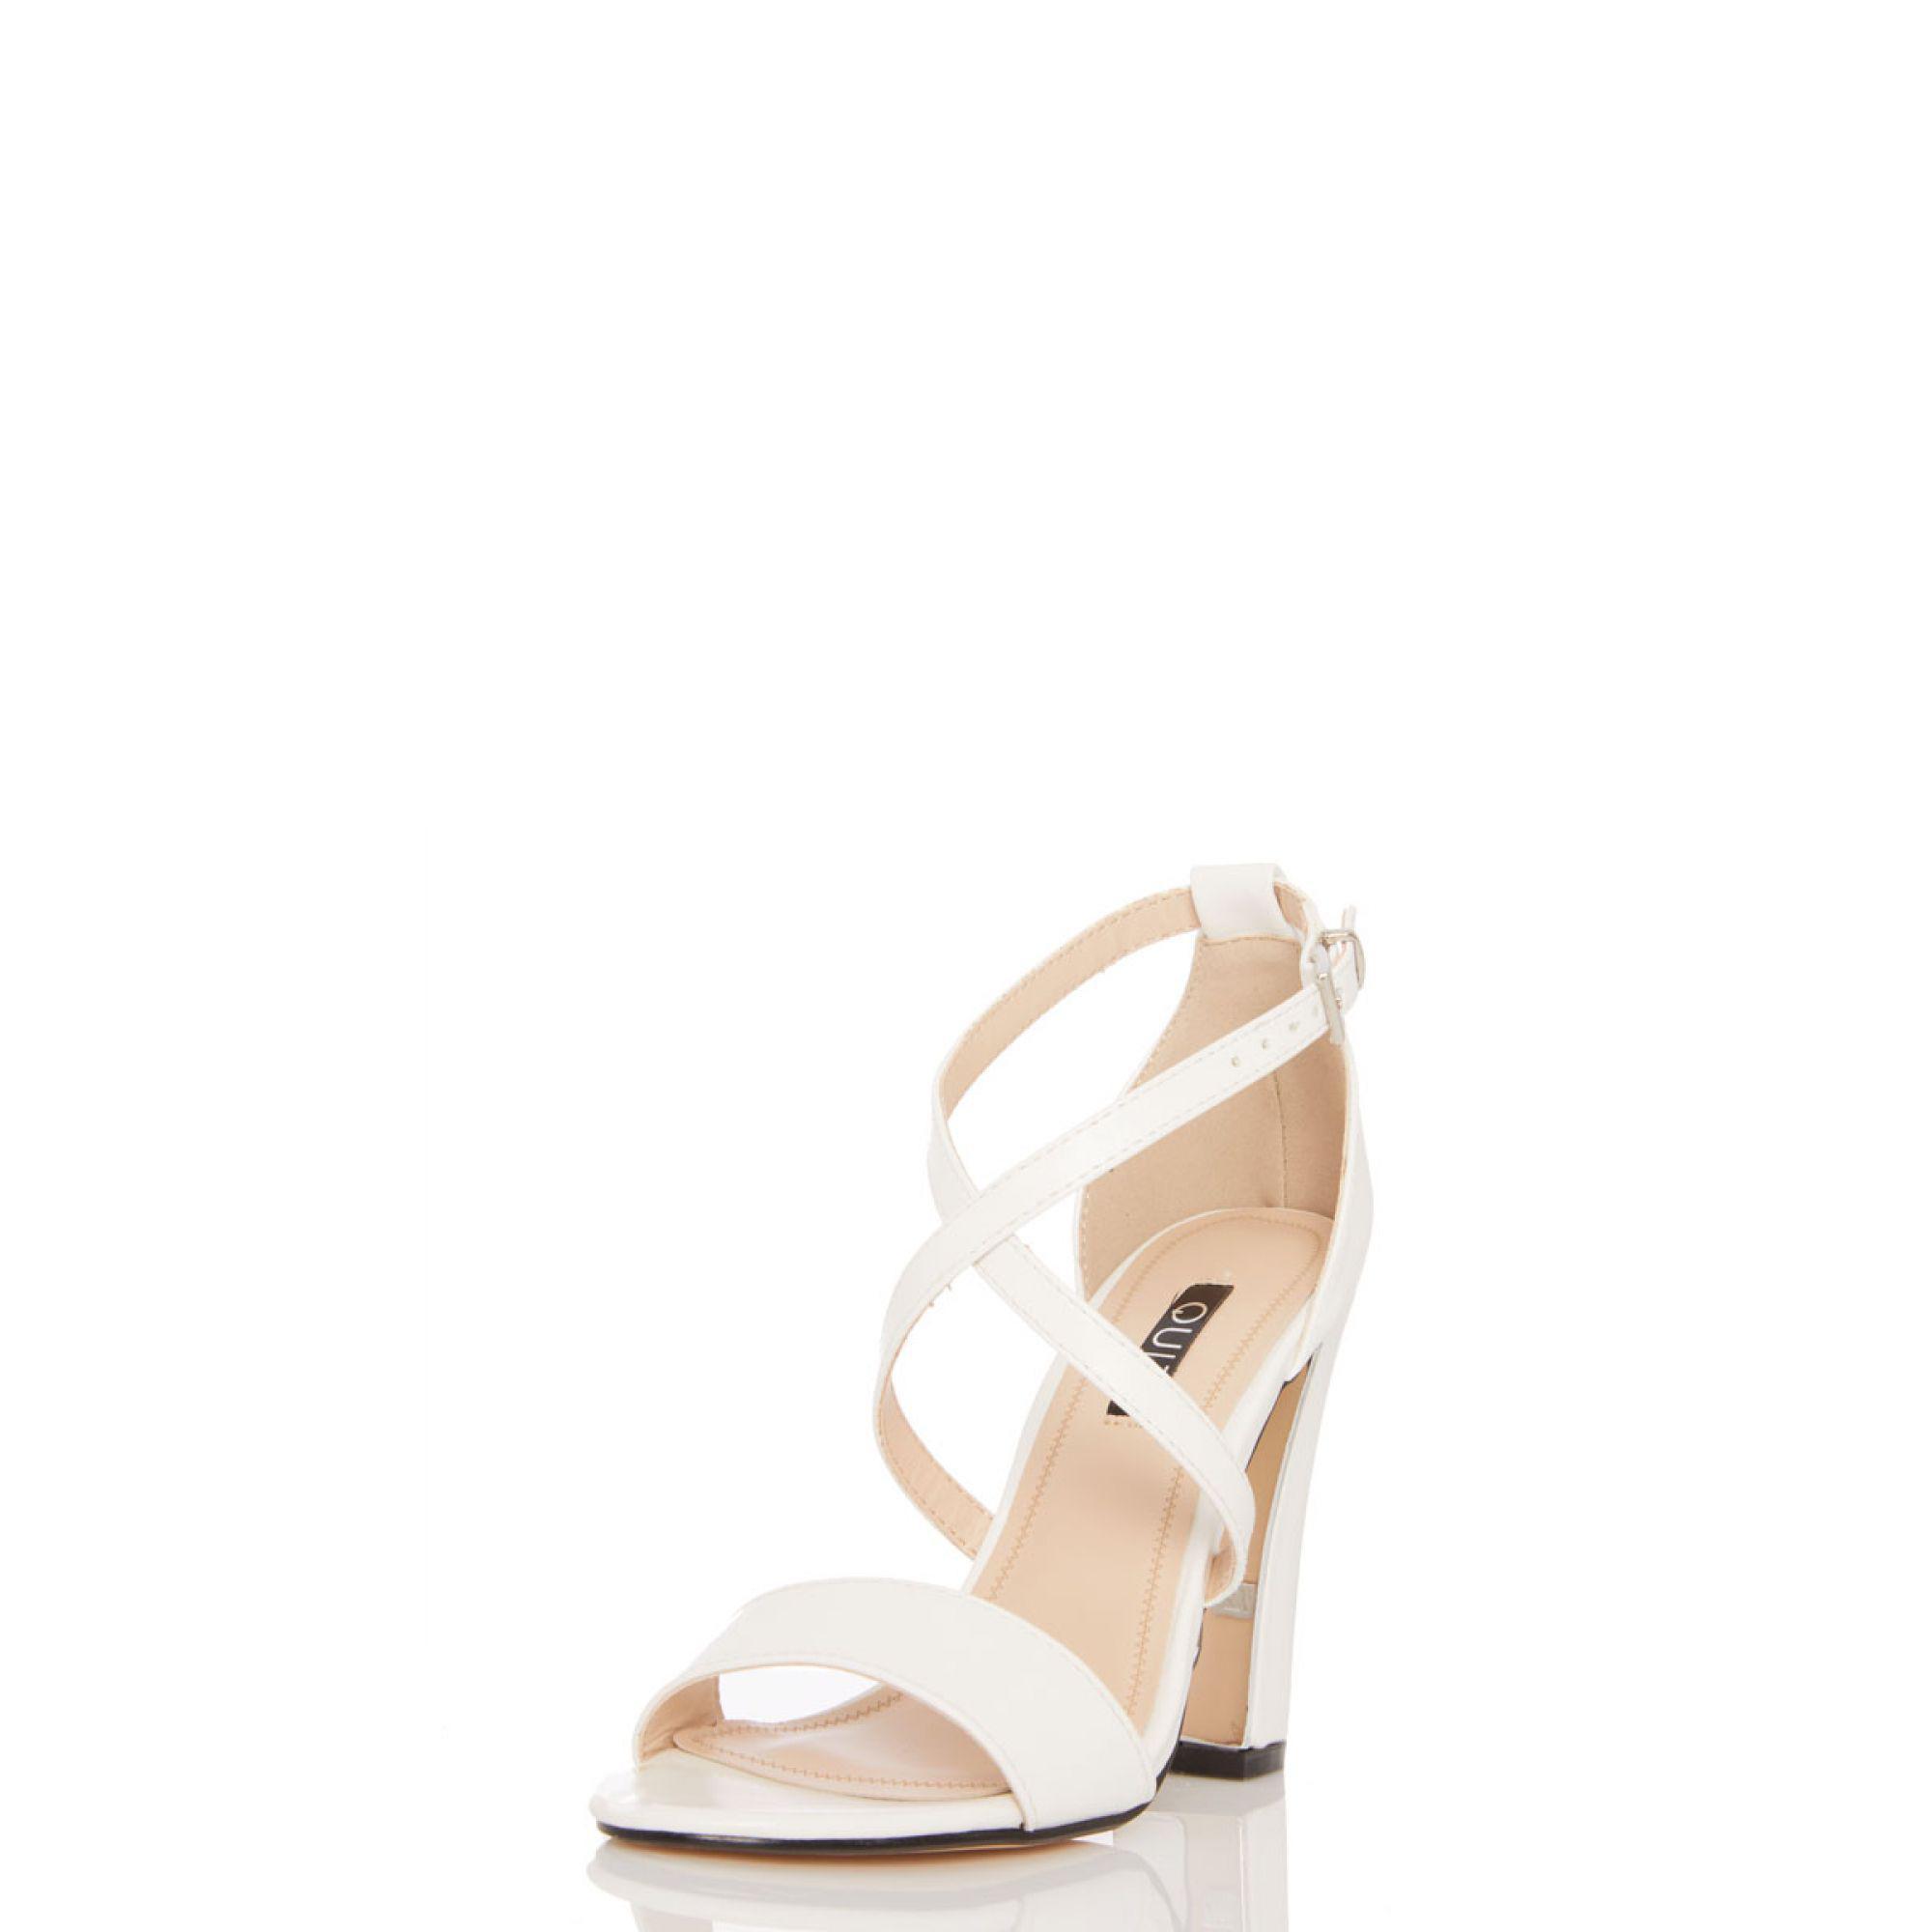 6895004be Quiz - White Cross Strap Chunky Heel Sandals - Lyst. View fullscreen